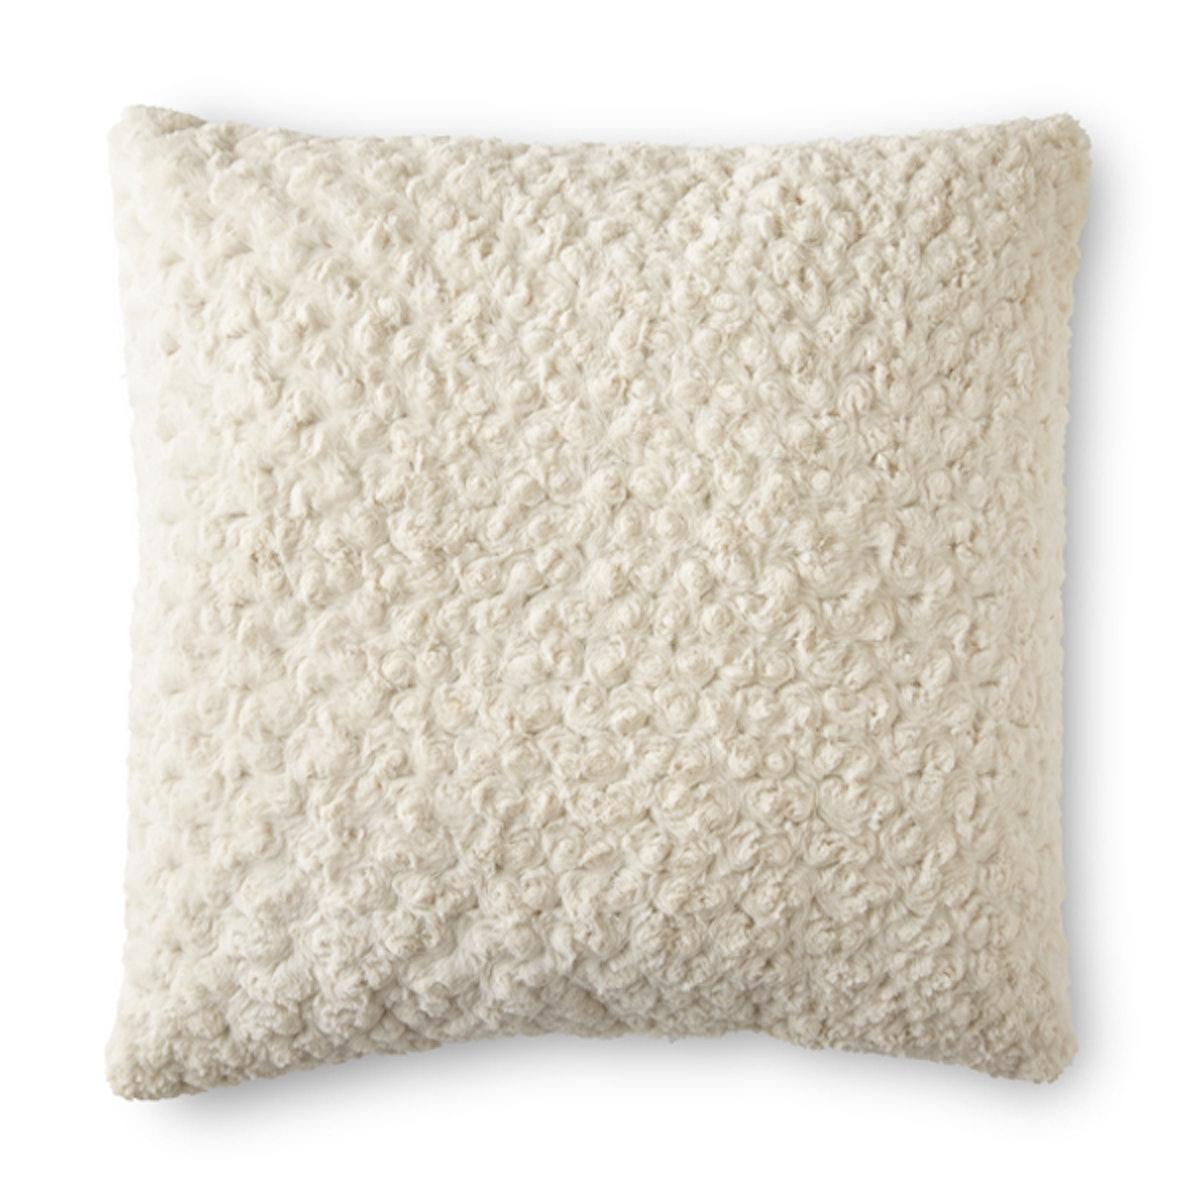 Rosette Plush Decorative Toss Pillow